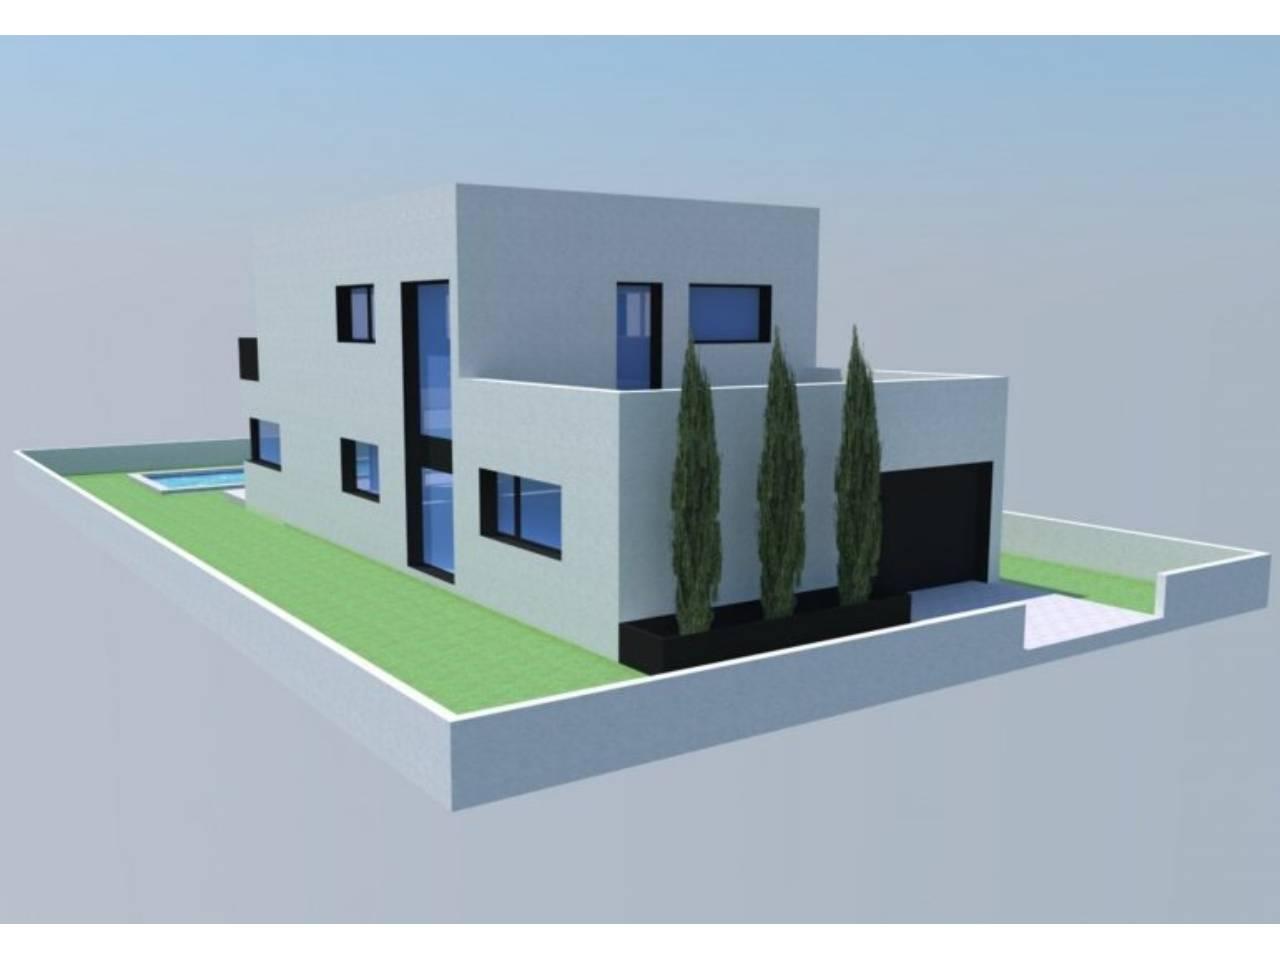 060447 - GARRIGUELLA House model  PERALADA